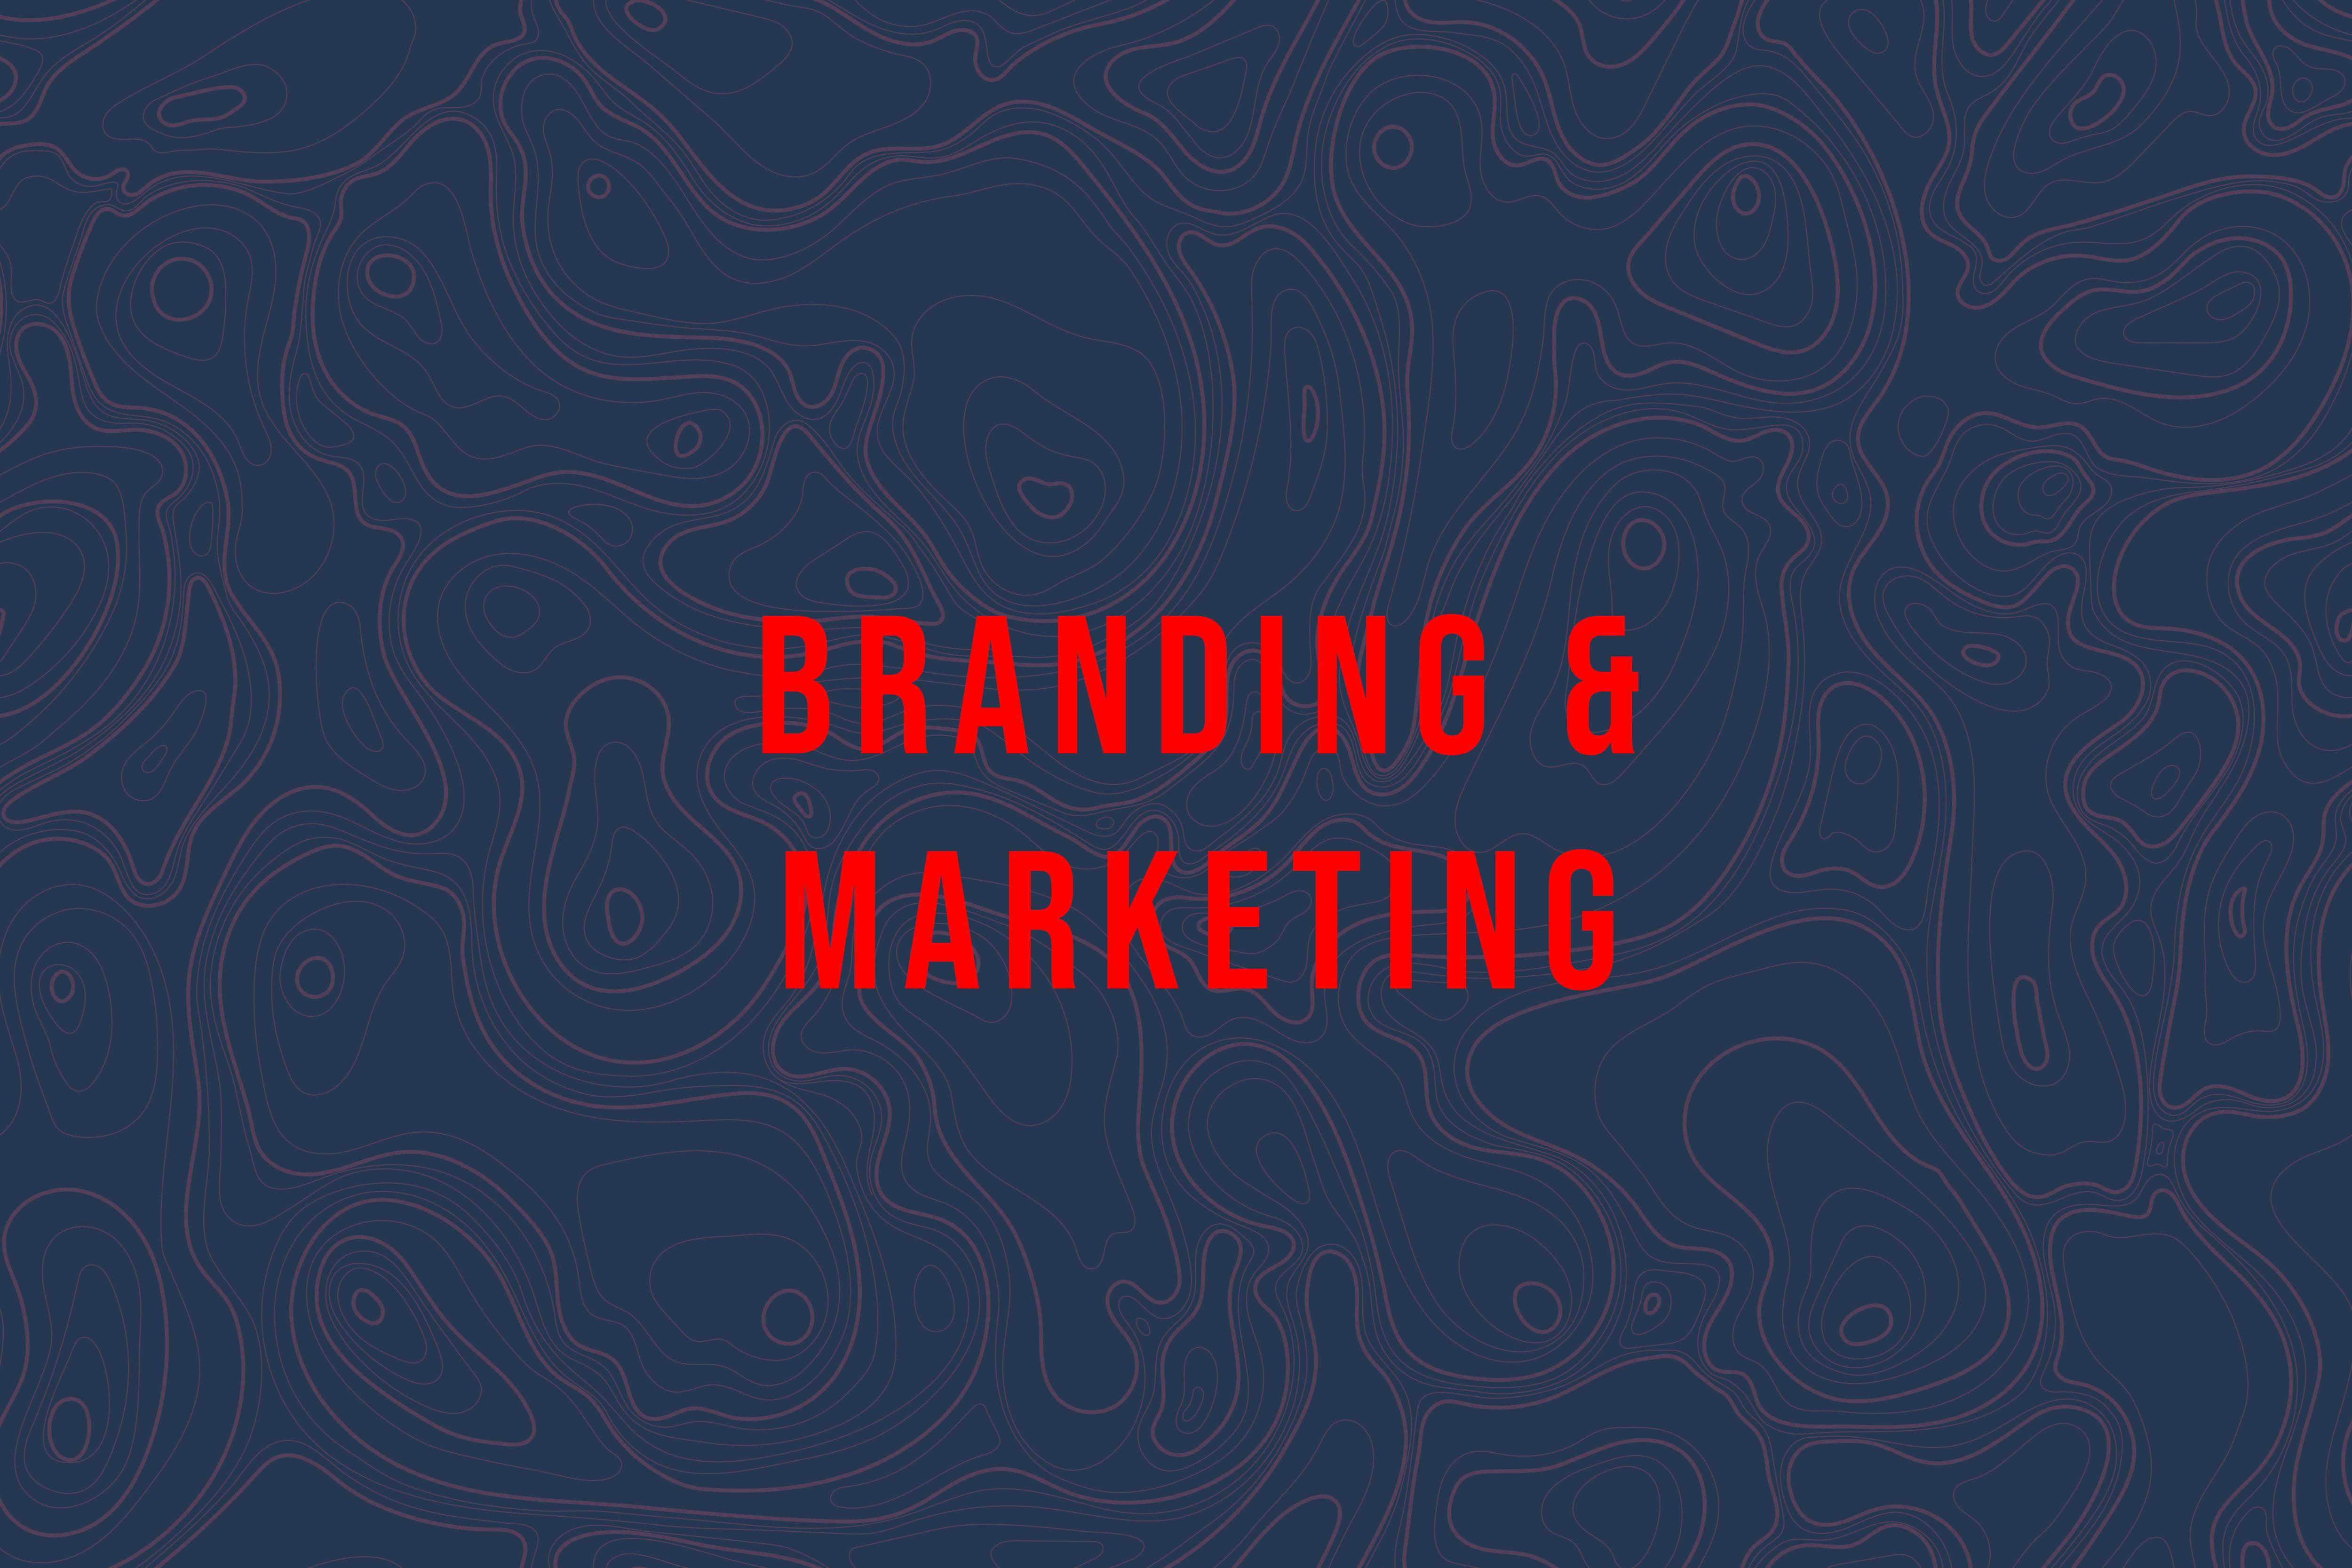 FREE Marketing & Branding Consultation